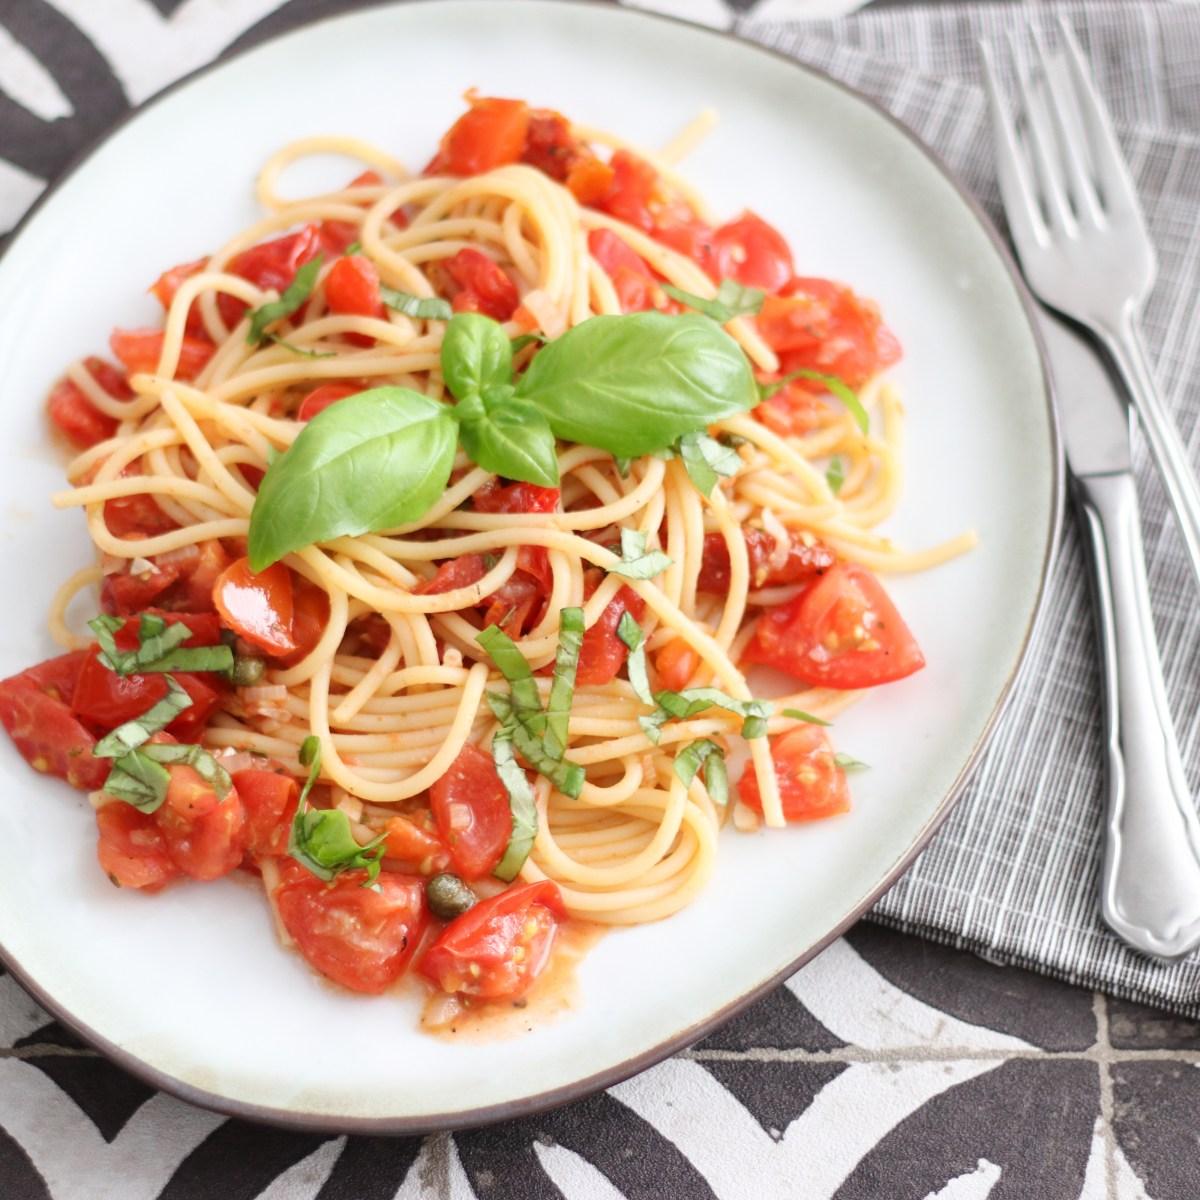 Spaghetti met een saus van verse tomaten